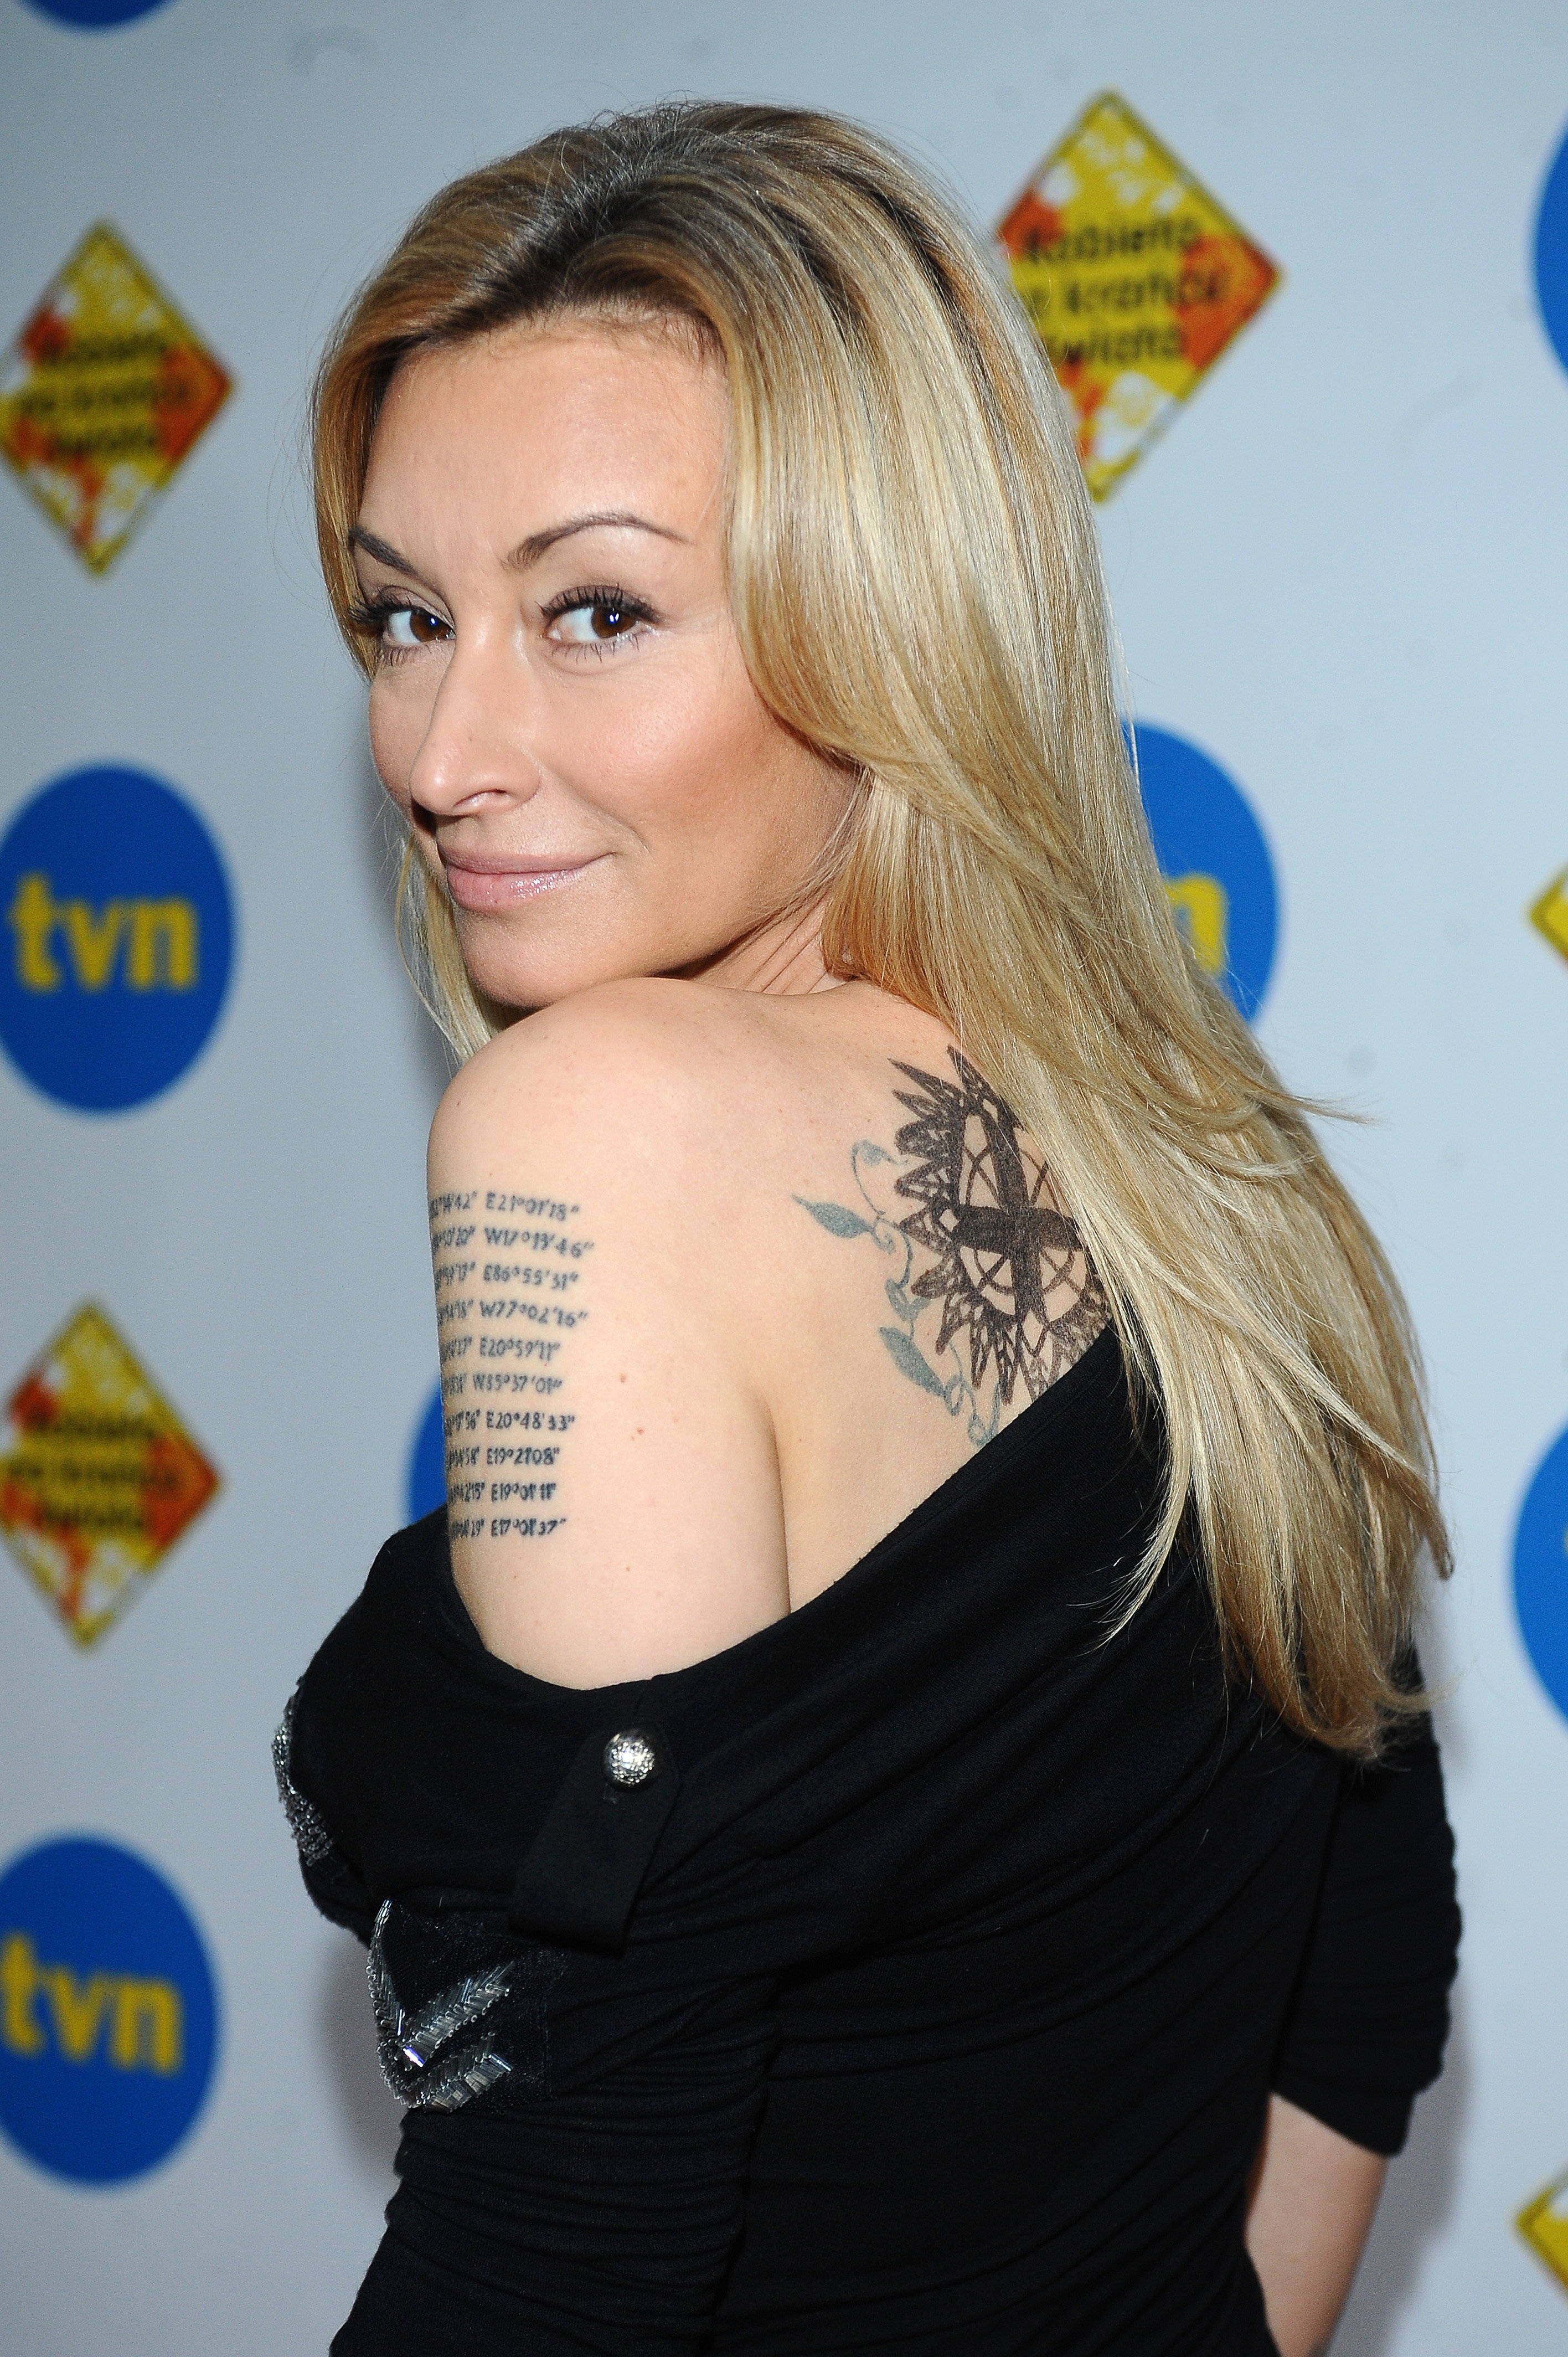 Martyna Wojciechowska Ma Nowe Tatuaże Plejadapl